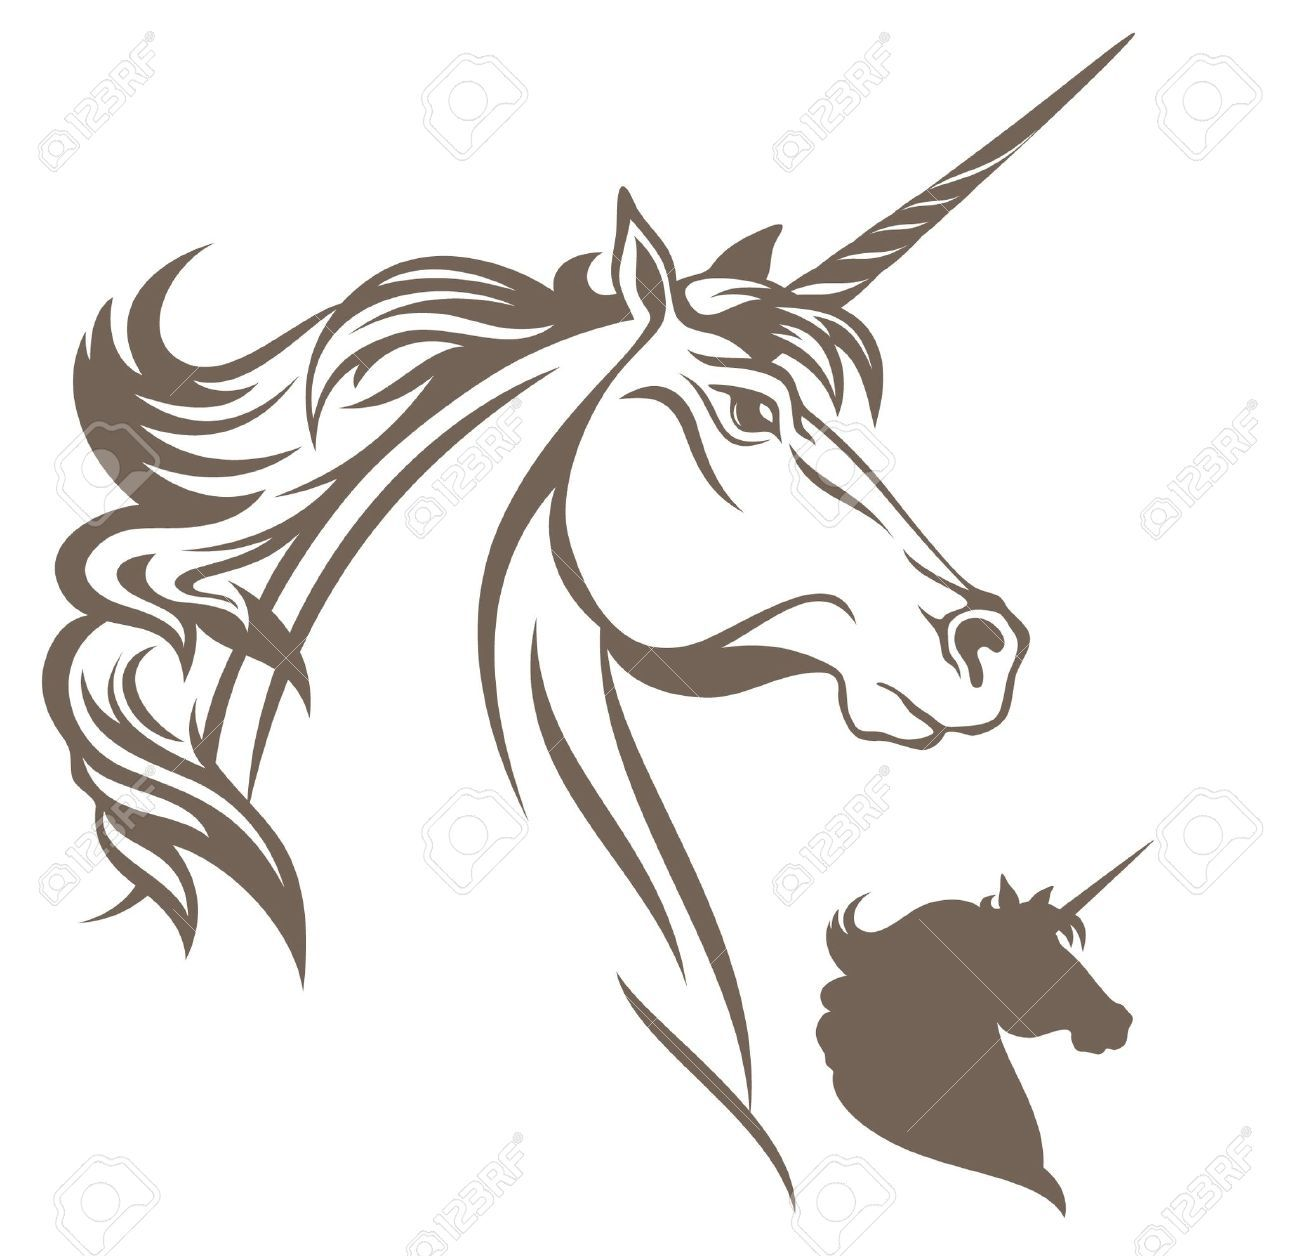 Unicorn Vector Illustration Royalty Free Cliparts, Vectors